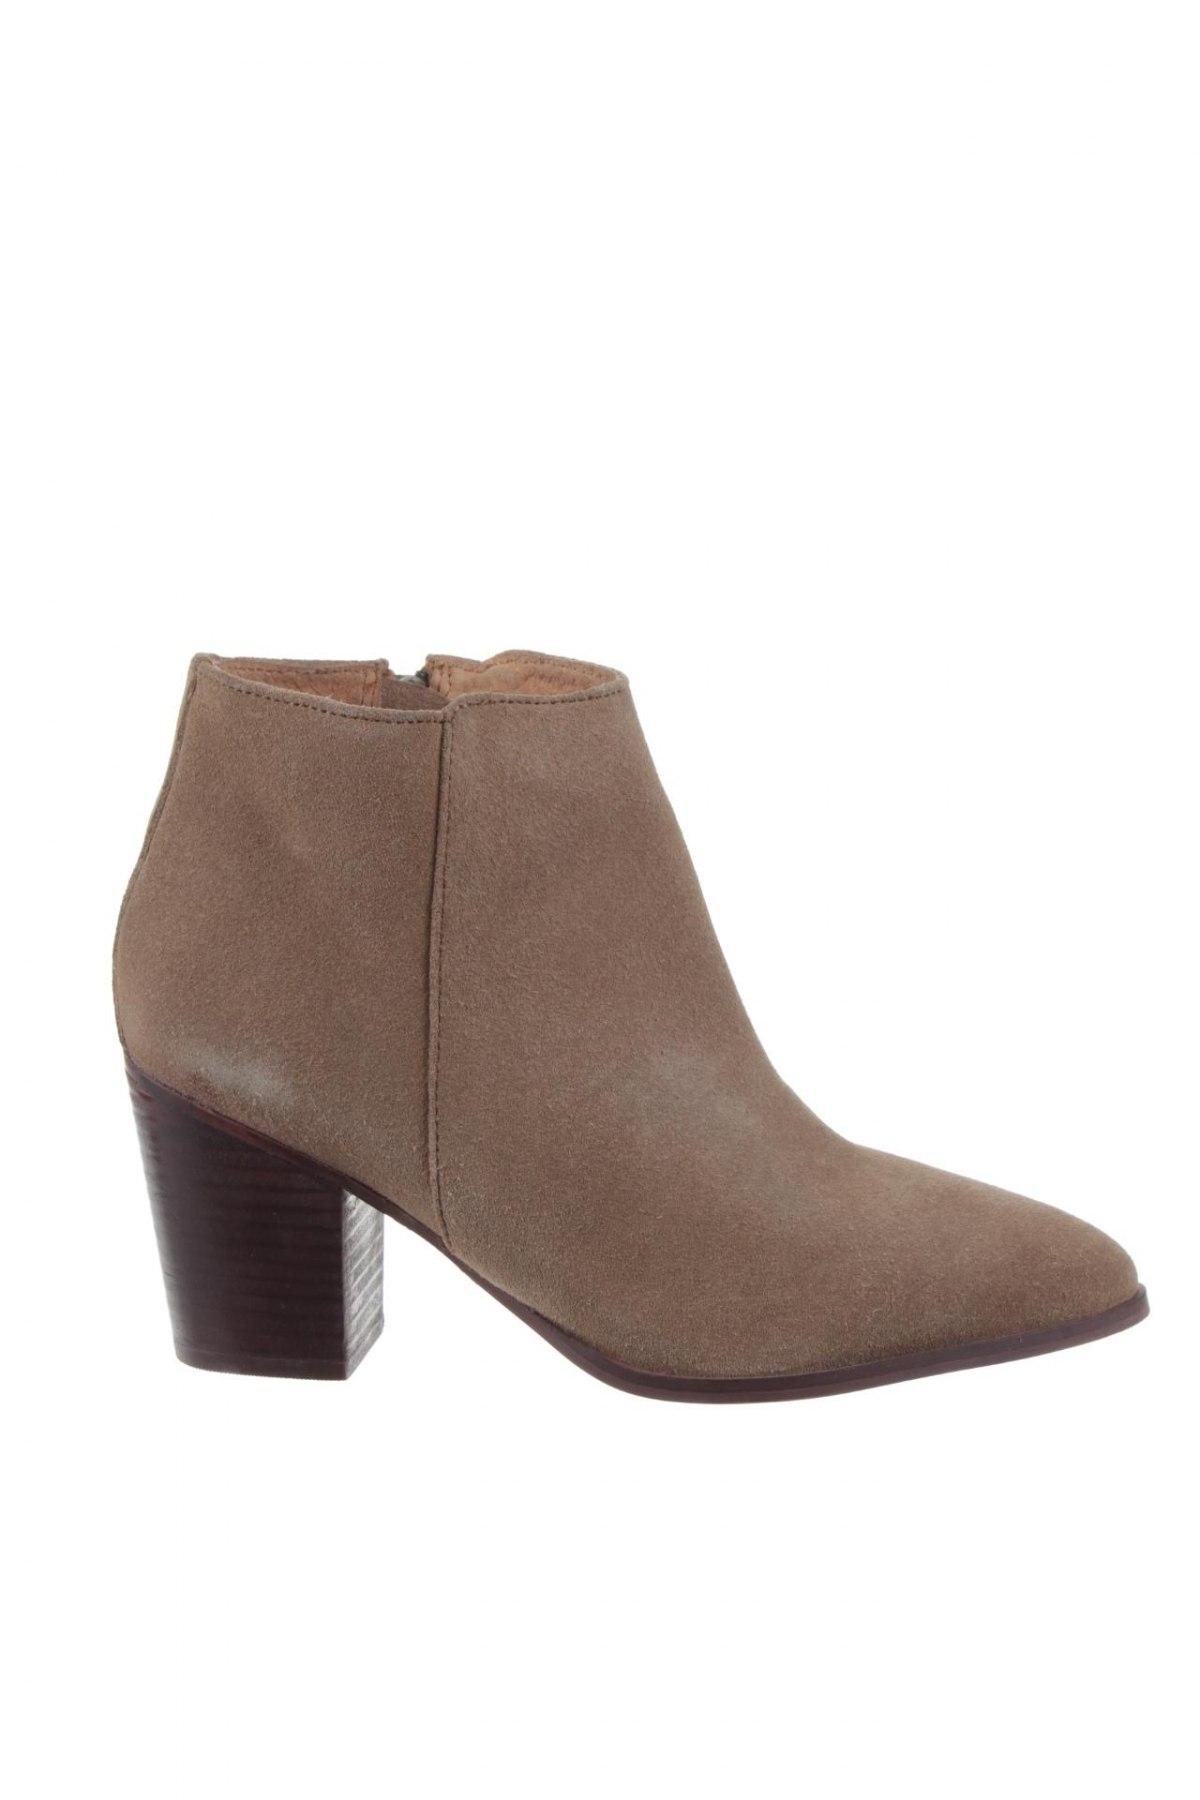 women 39 s ankle boots kiomi 8881483 remix. Black Bedroom Furniture Sets. Home Design Ideas